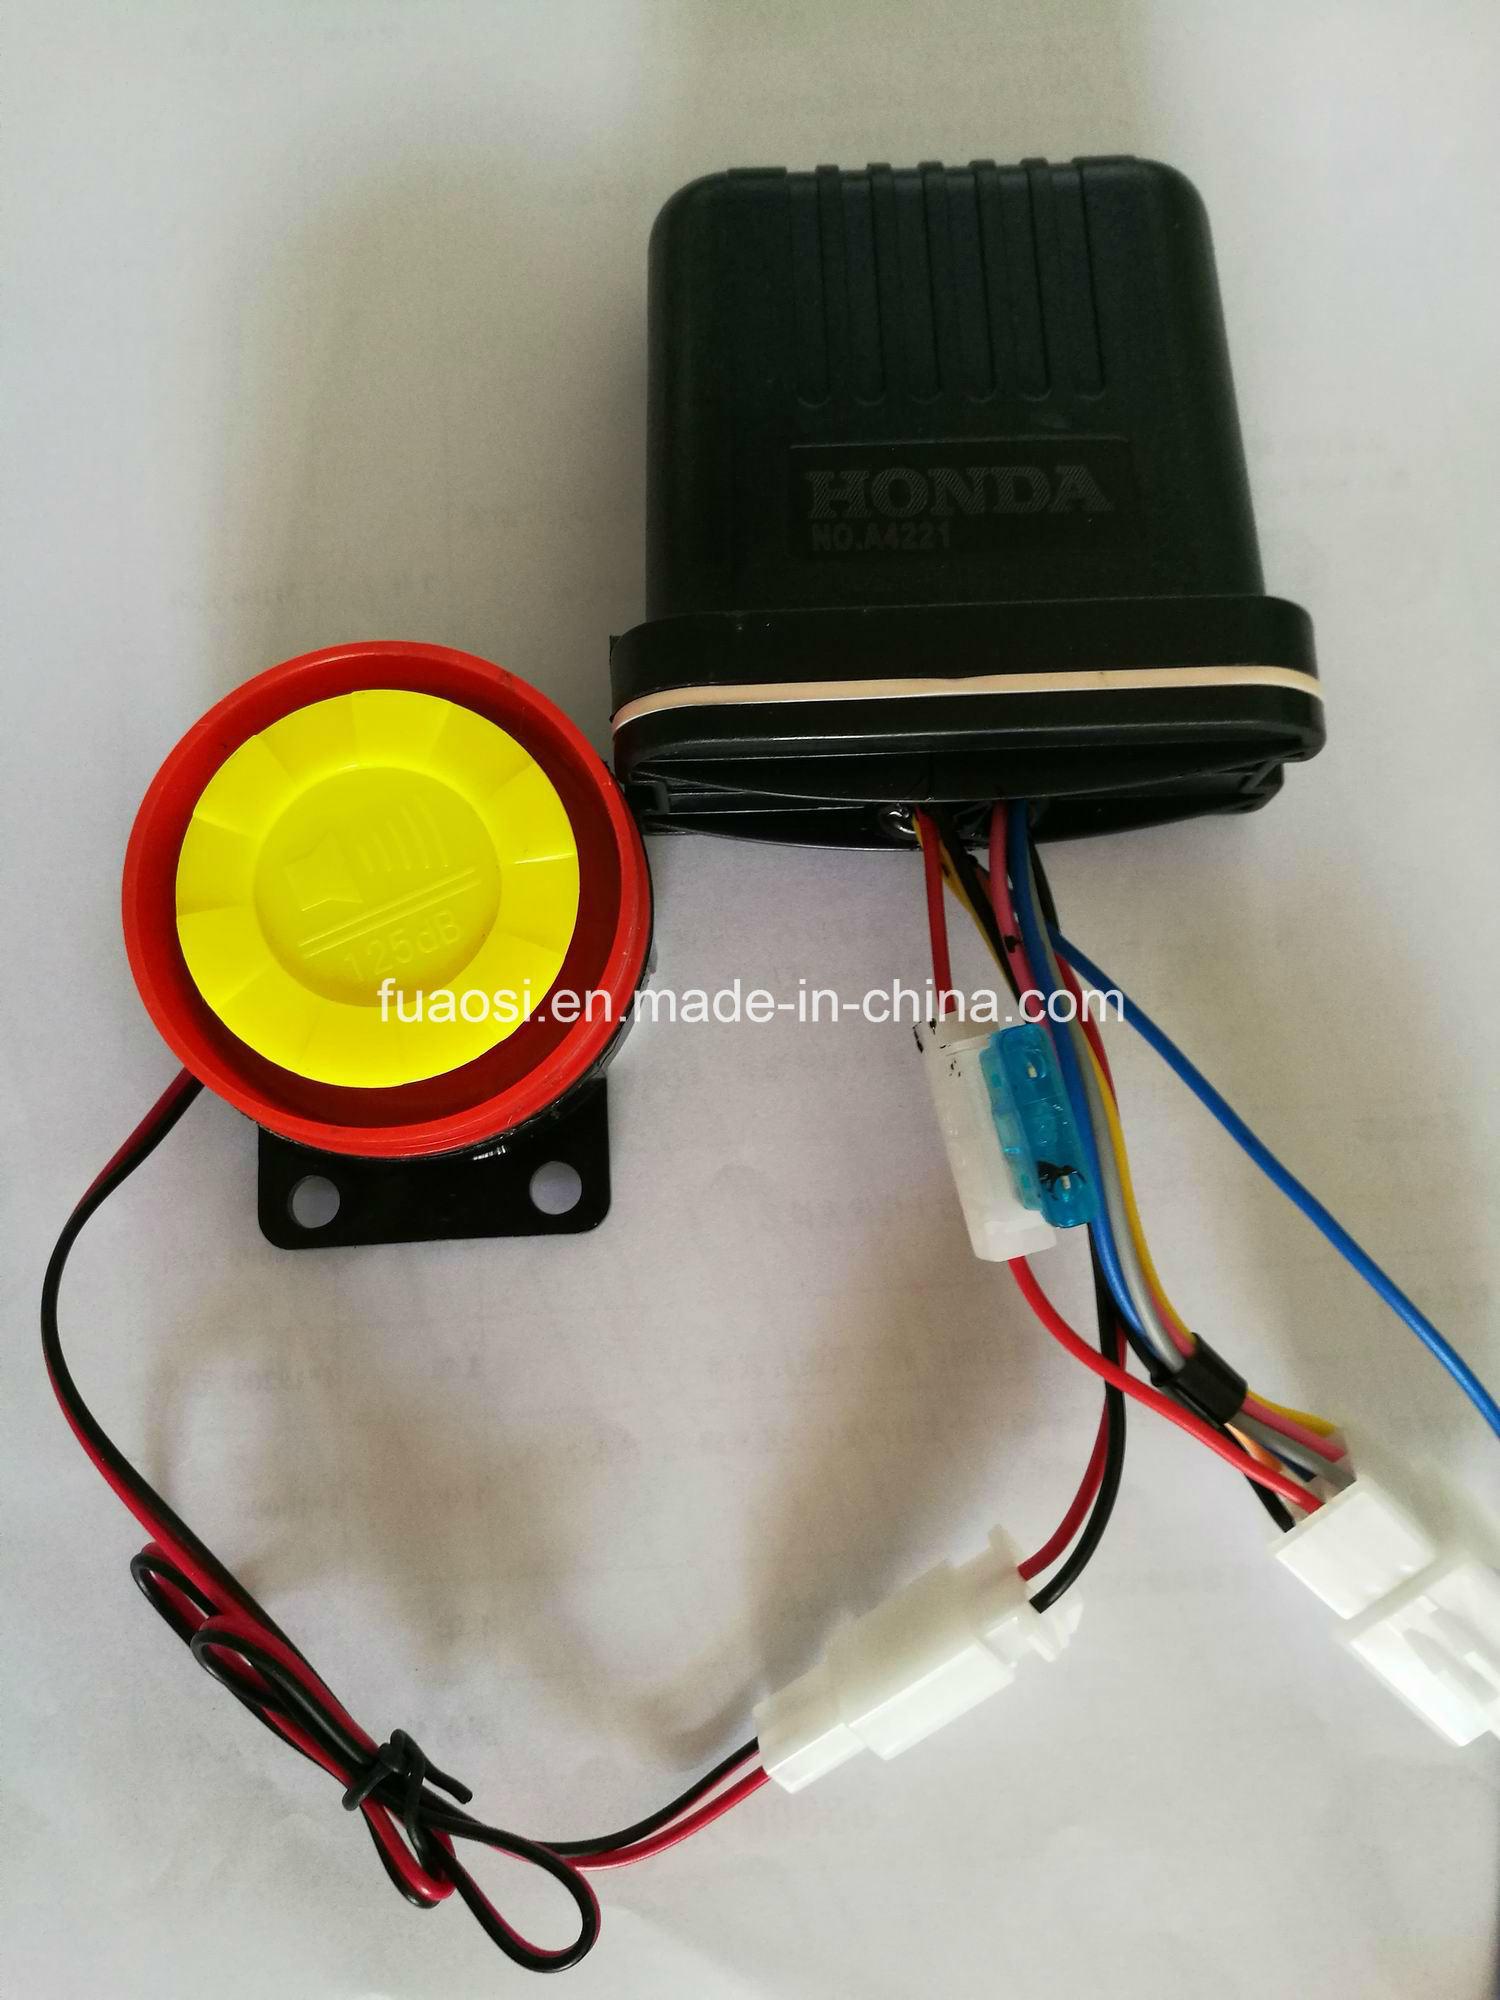 2 Way Motorcycle Alarm System